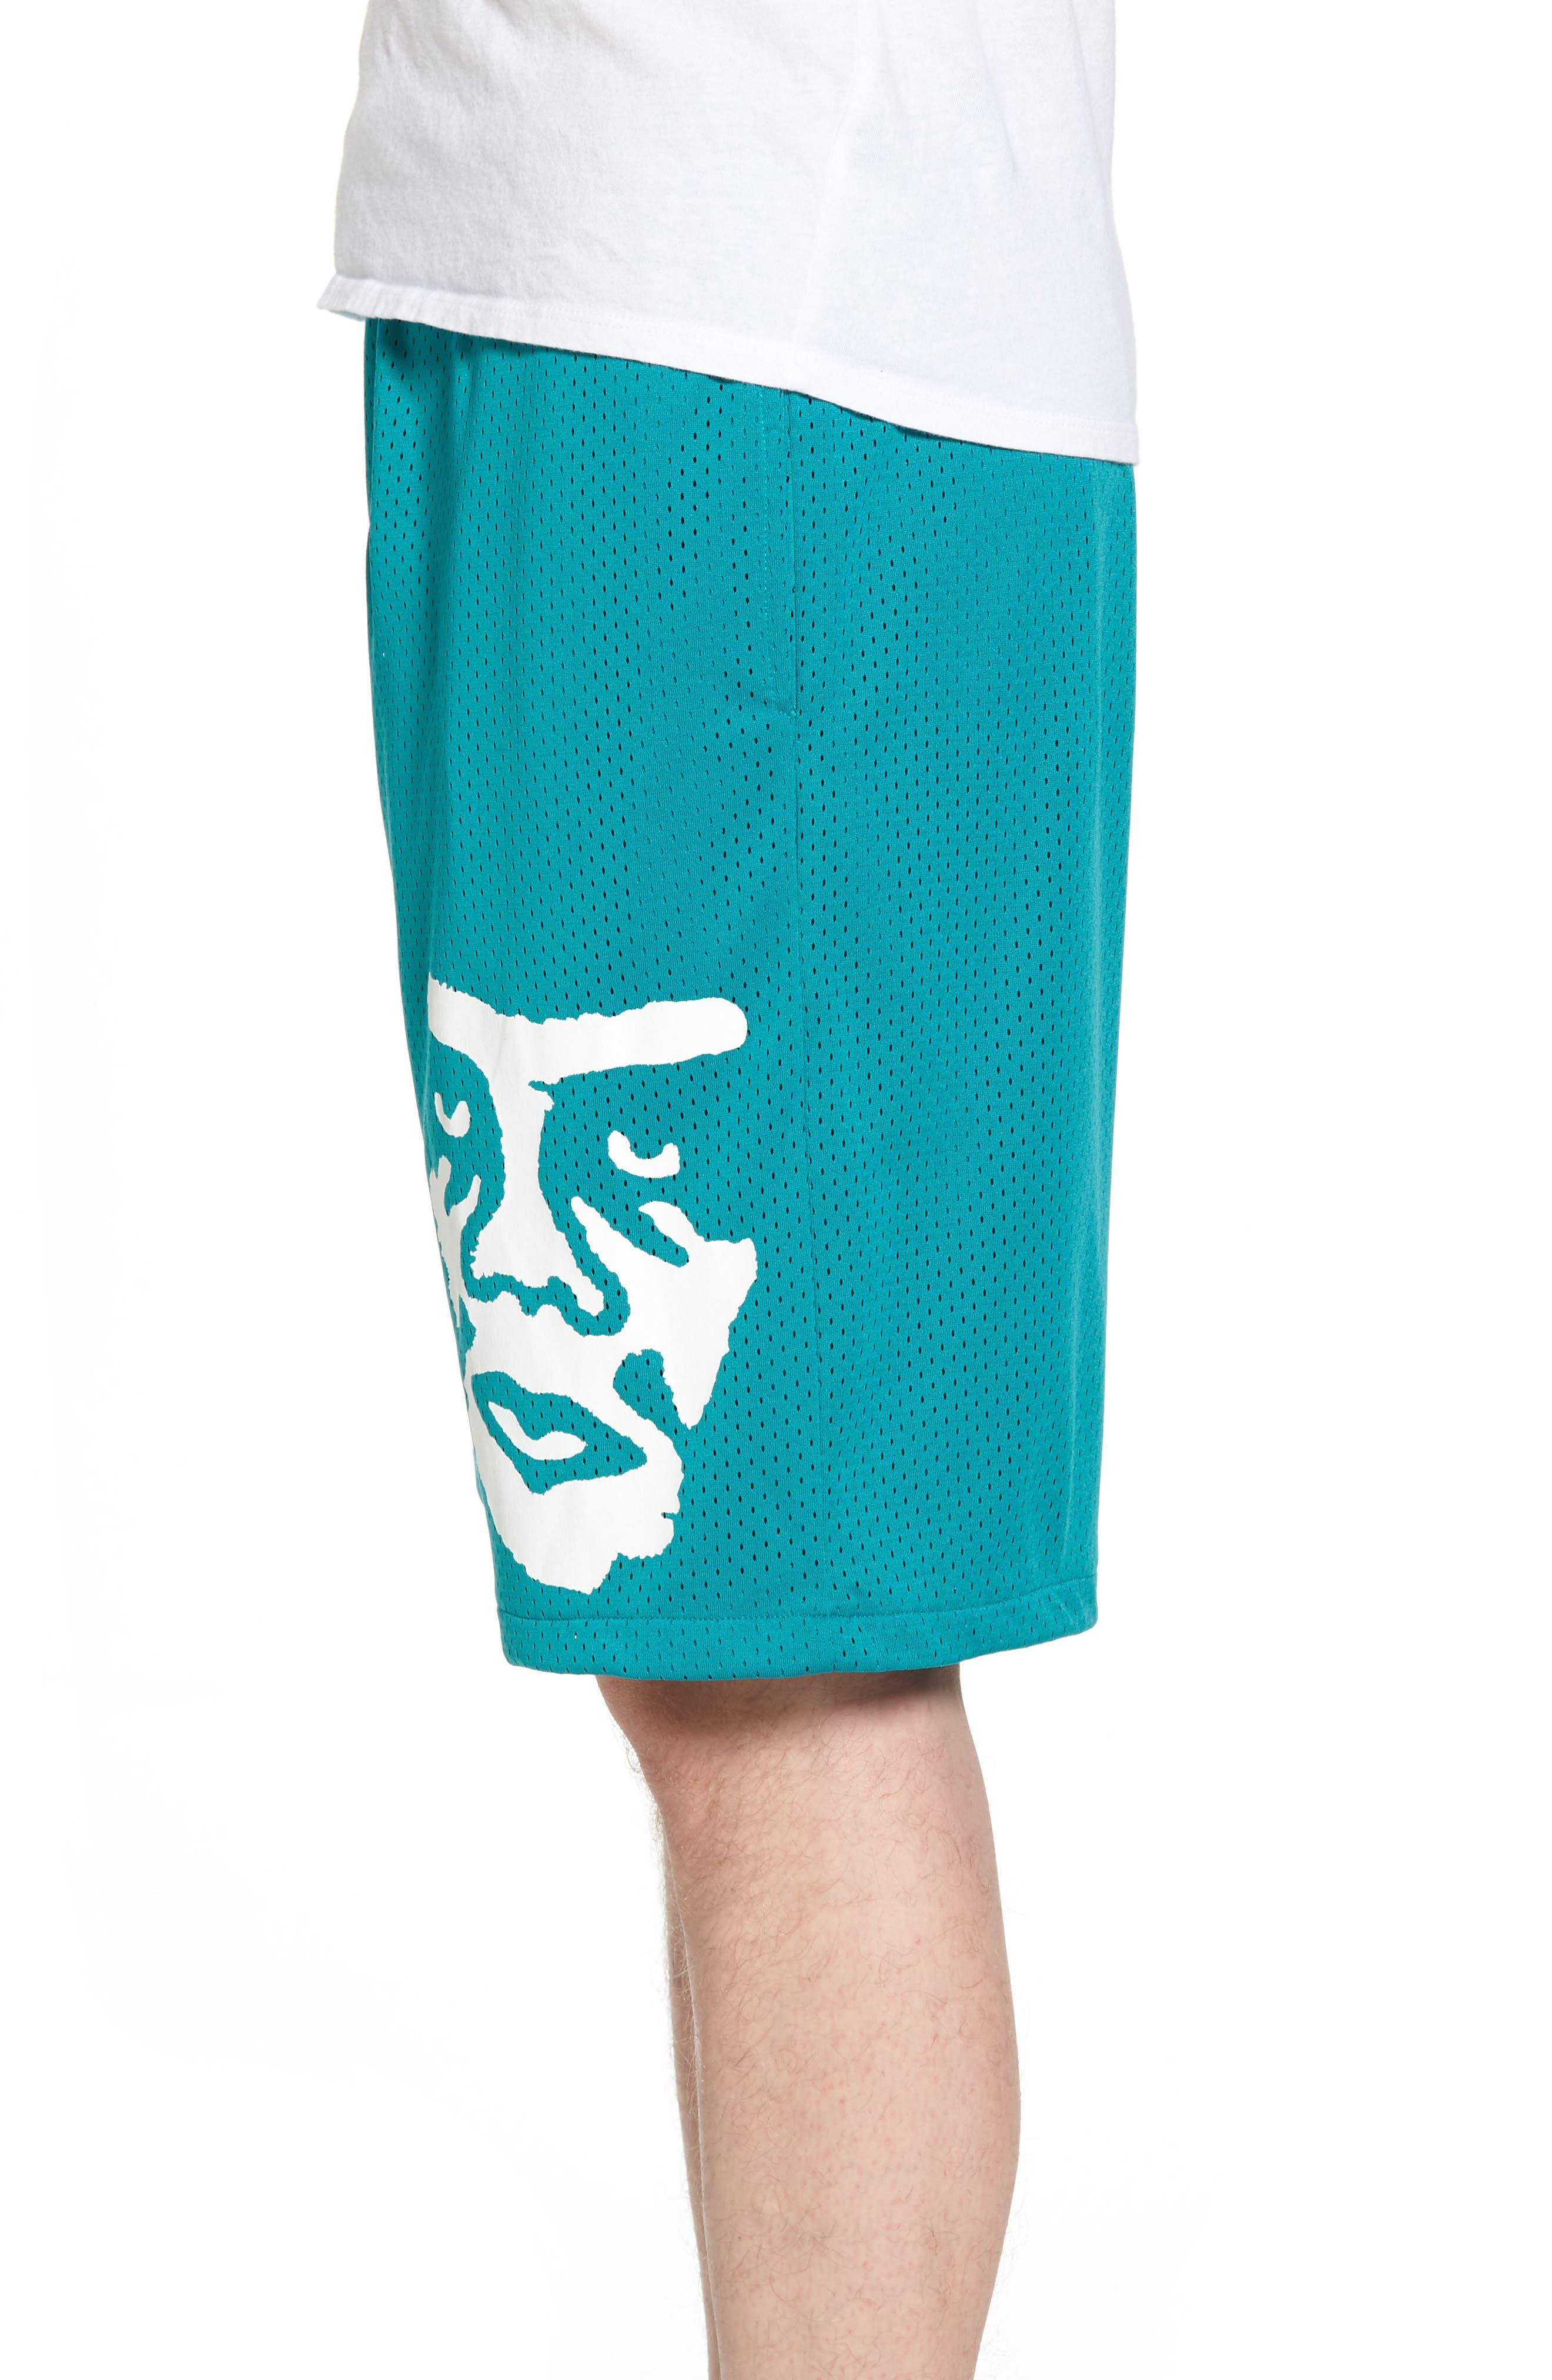 O.P.E. Athletic Shorts,                             Alternate thumbnail 3, color,                             445